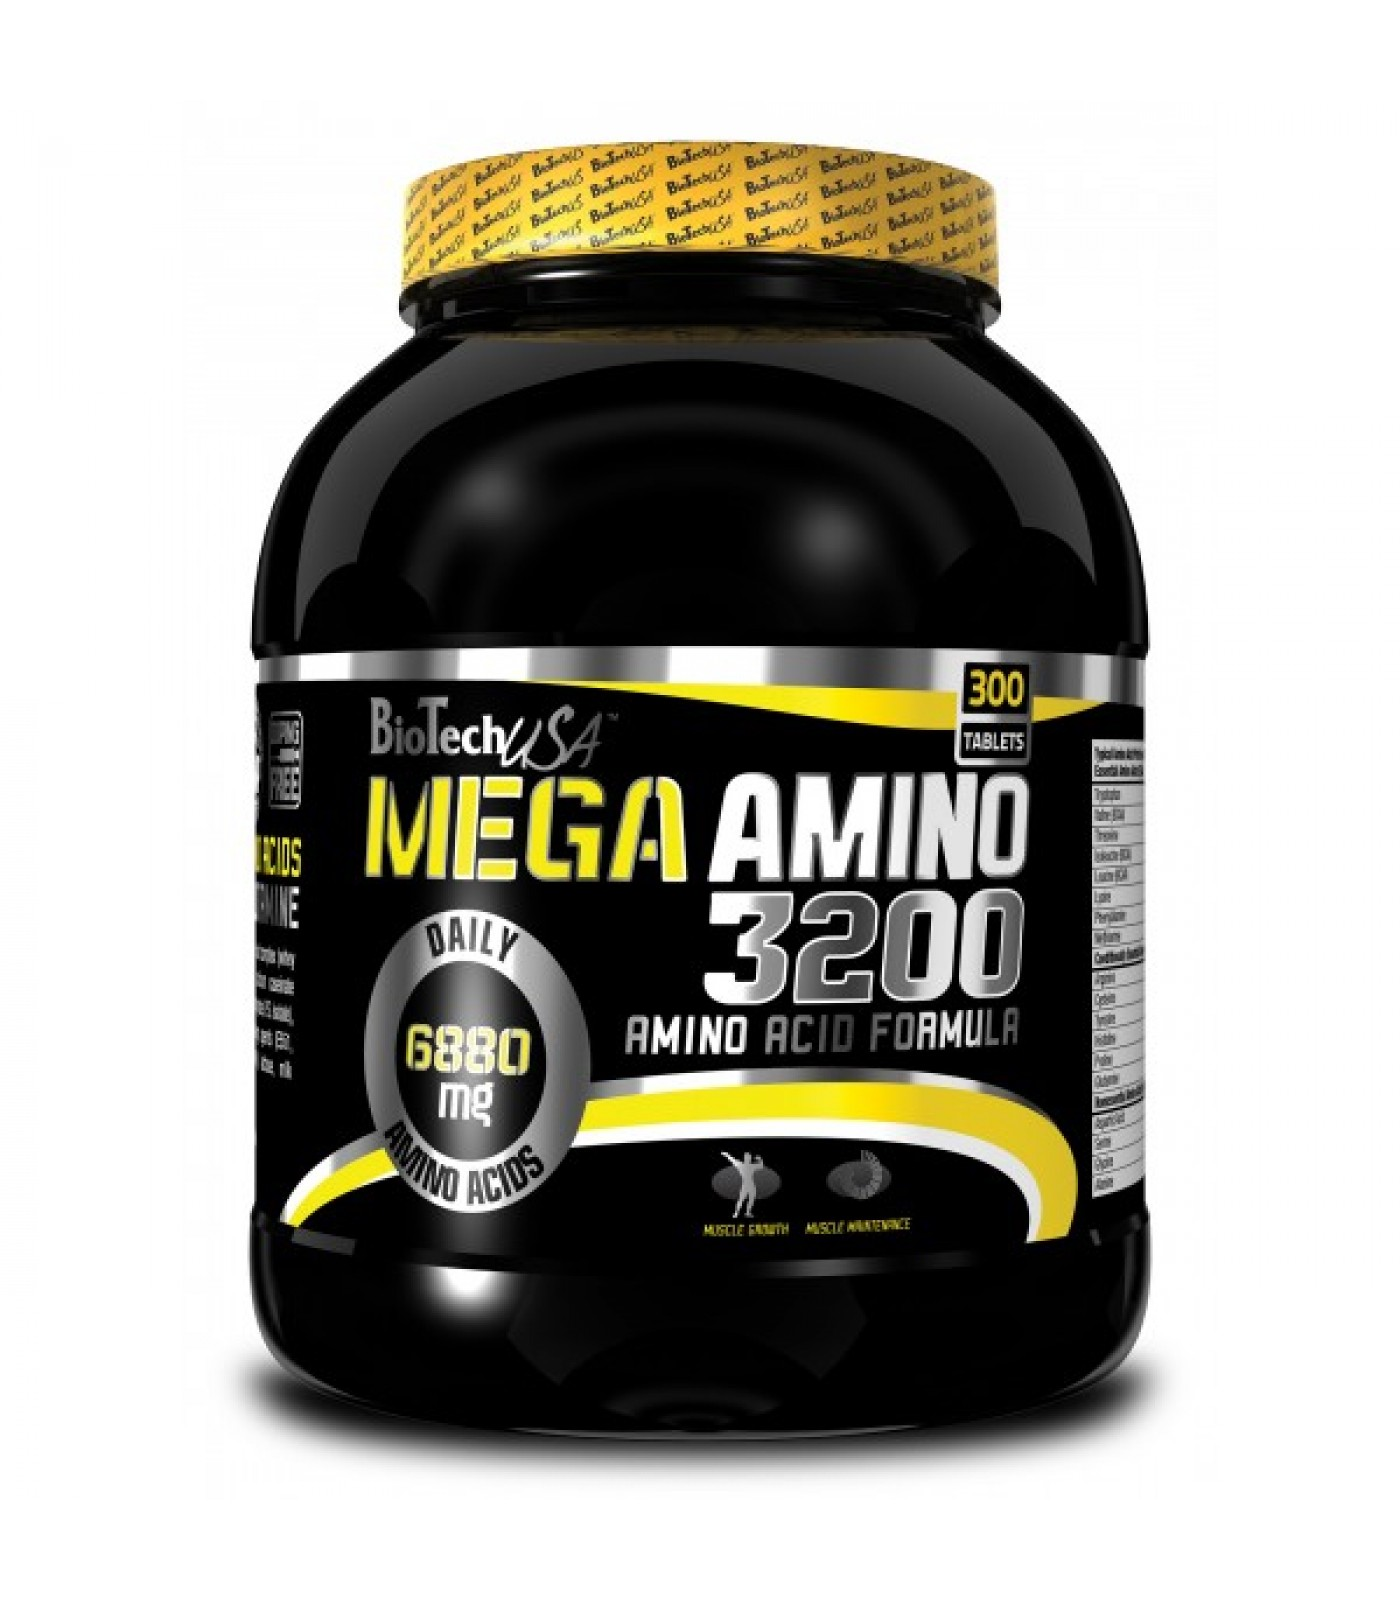 BioTech - Mega Amino 3200 / 300 tabs.